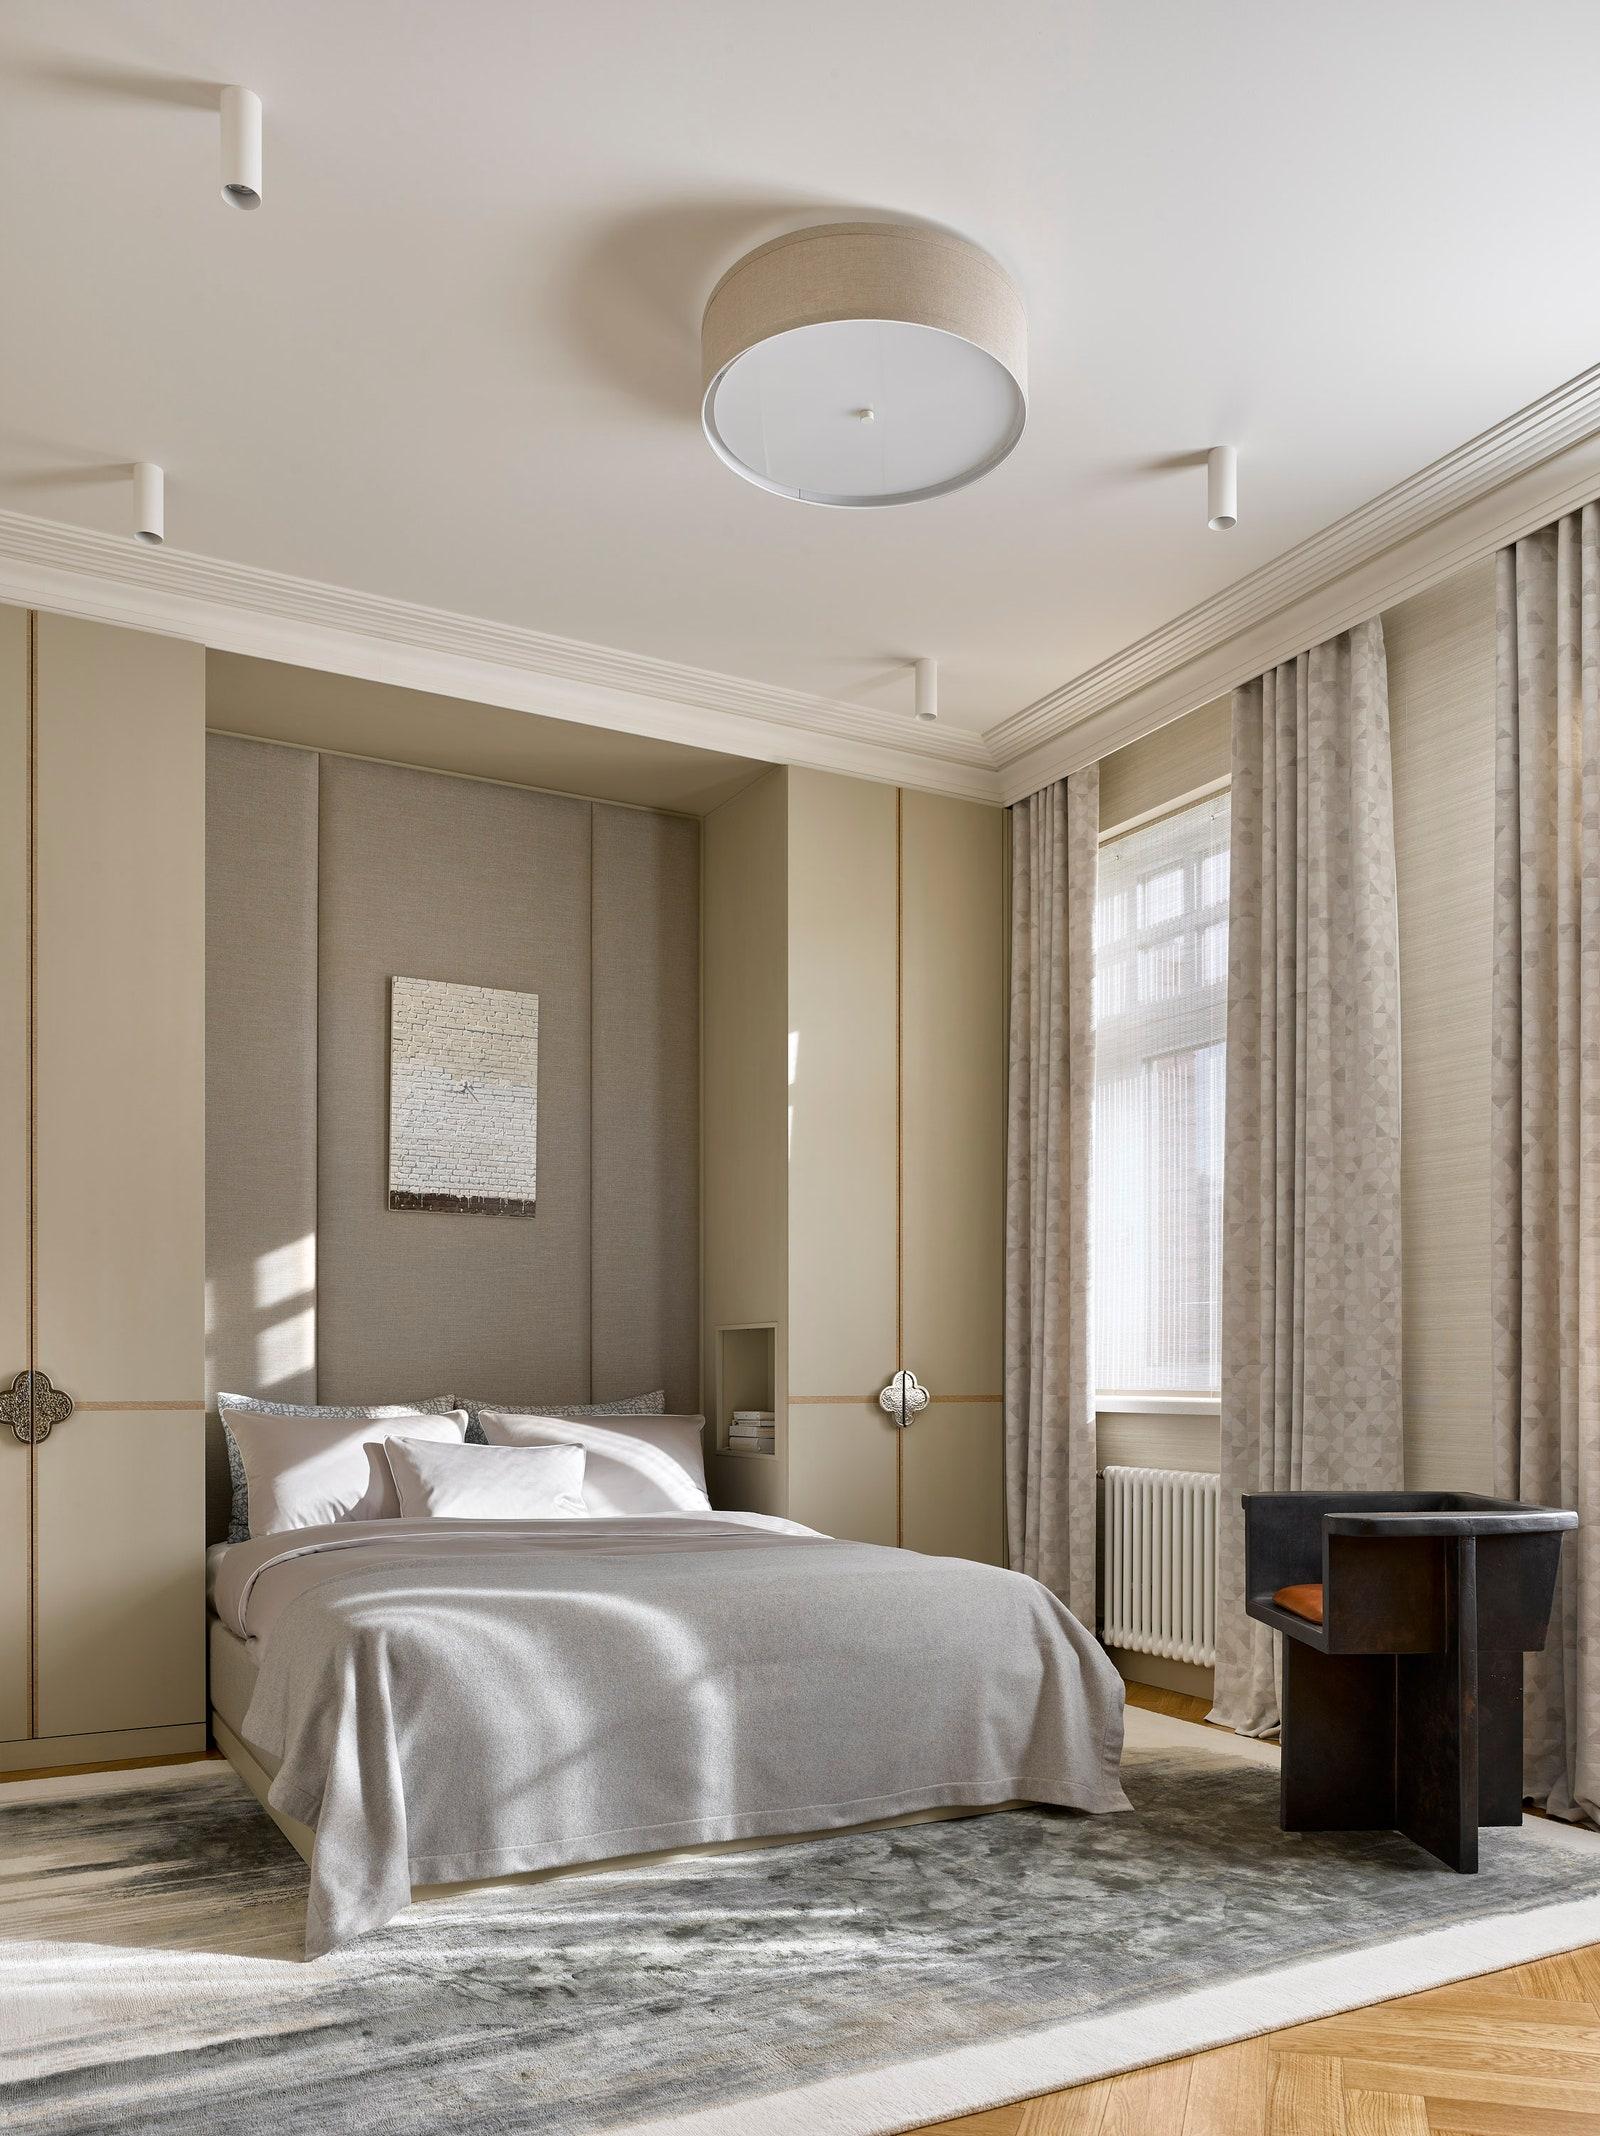 .        Argento Style  101 Copenhagen  Visual Comfort amp Co.  Dovlet House   AtelierTati   .